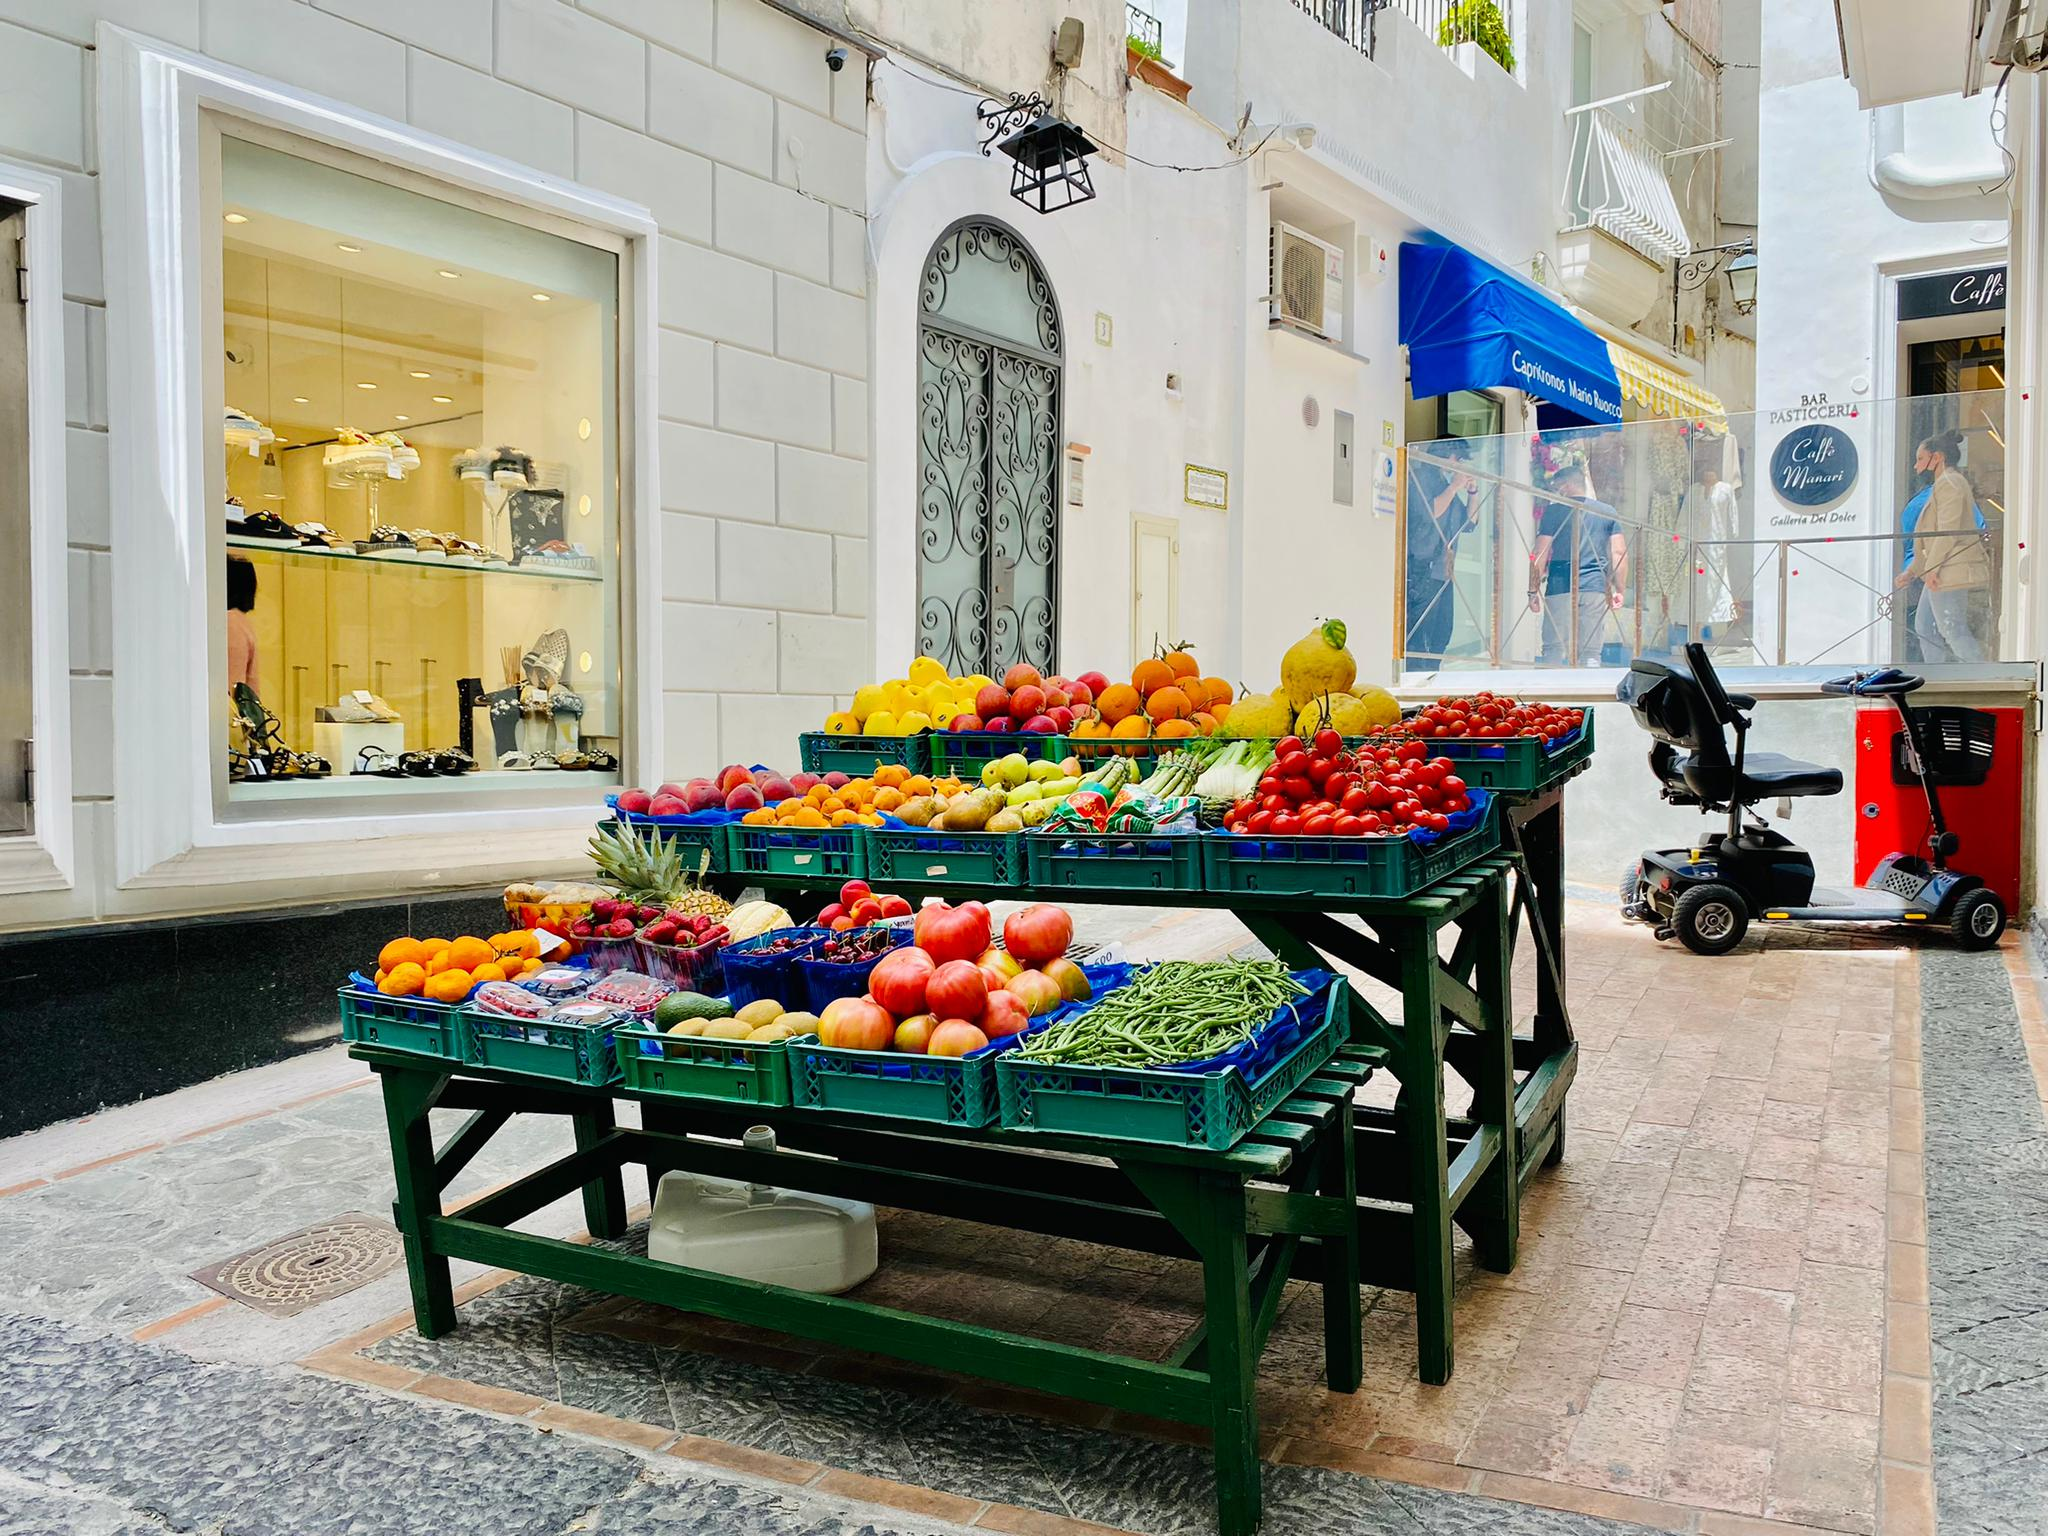 Gemüsestand auf Capri neben teuren Uhren